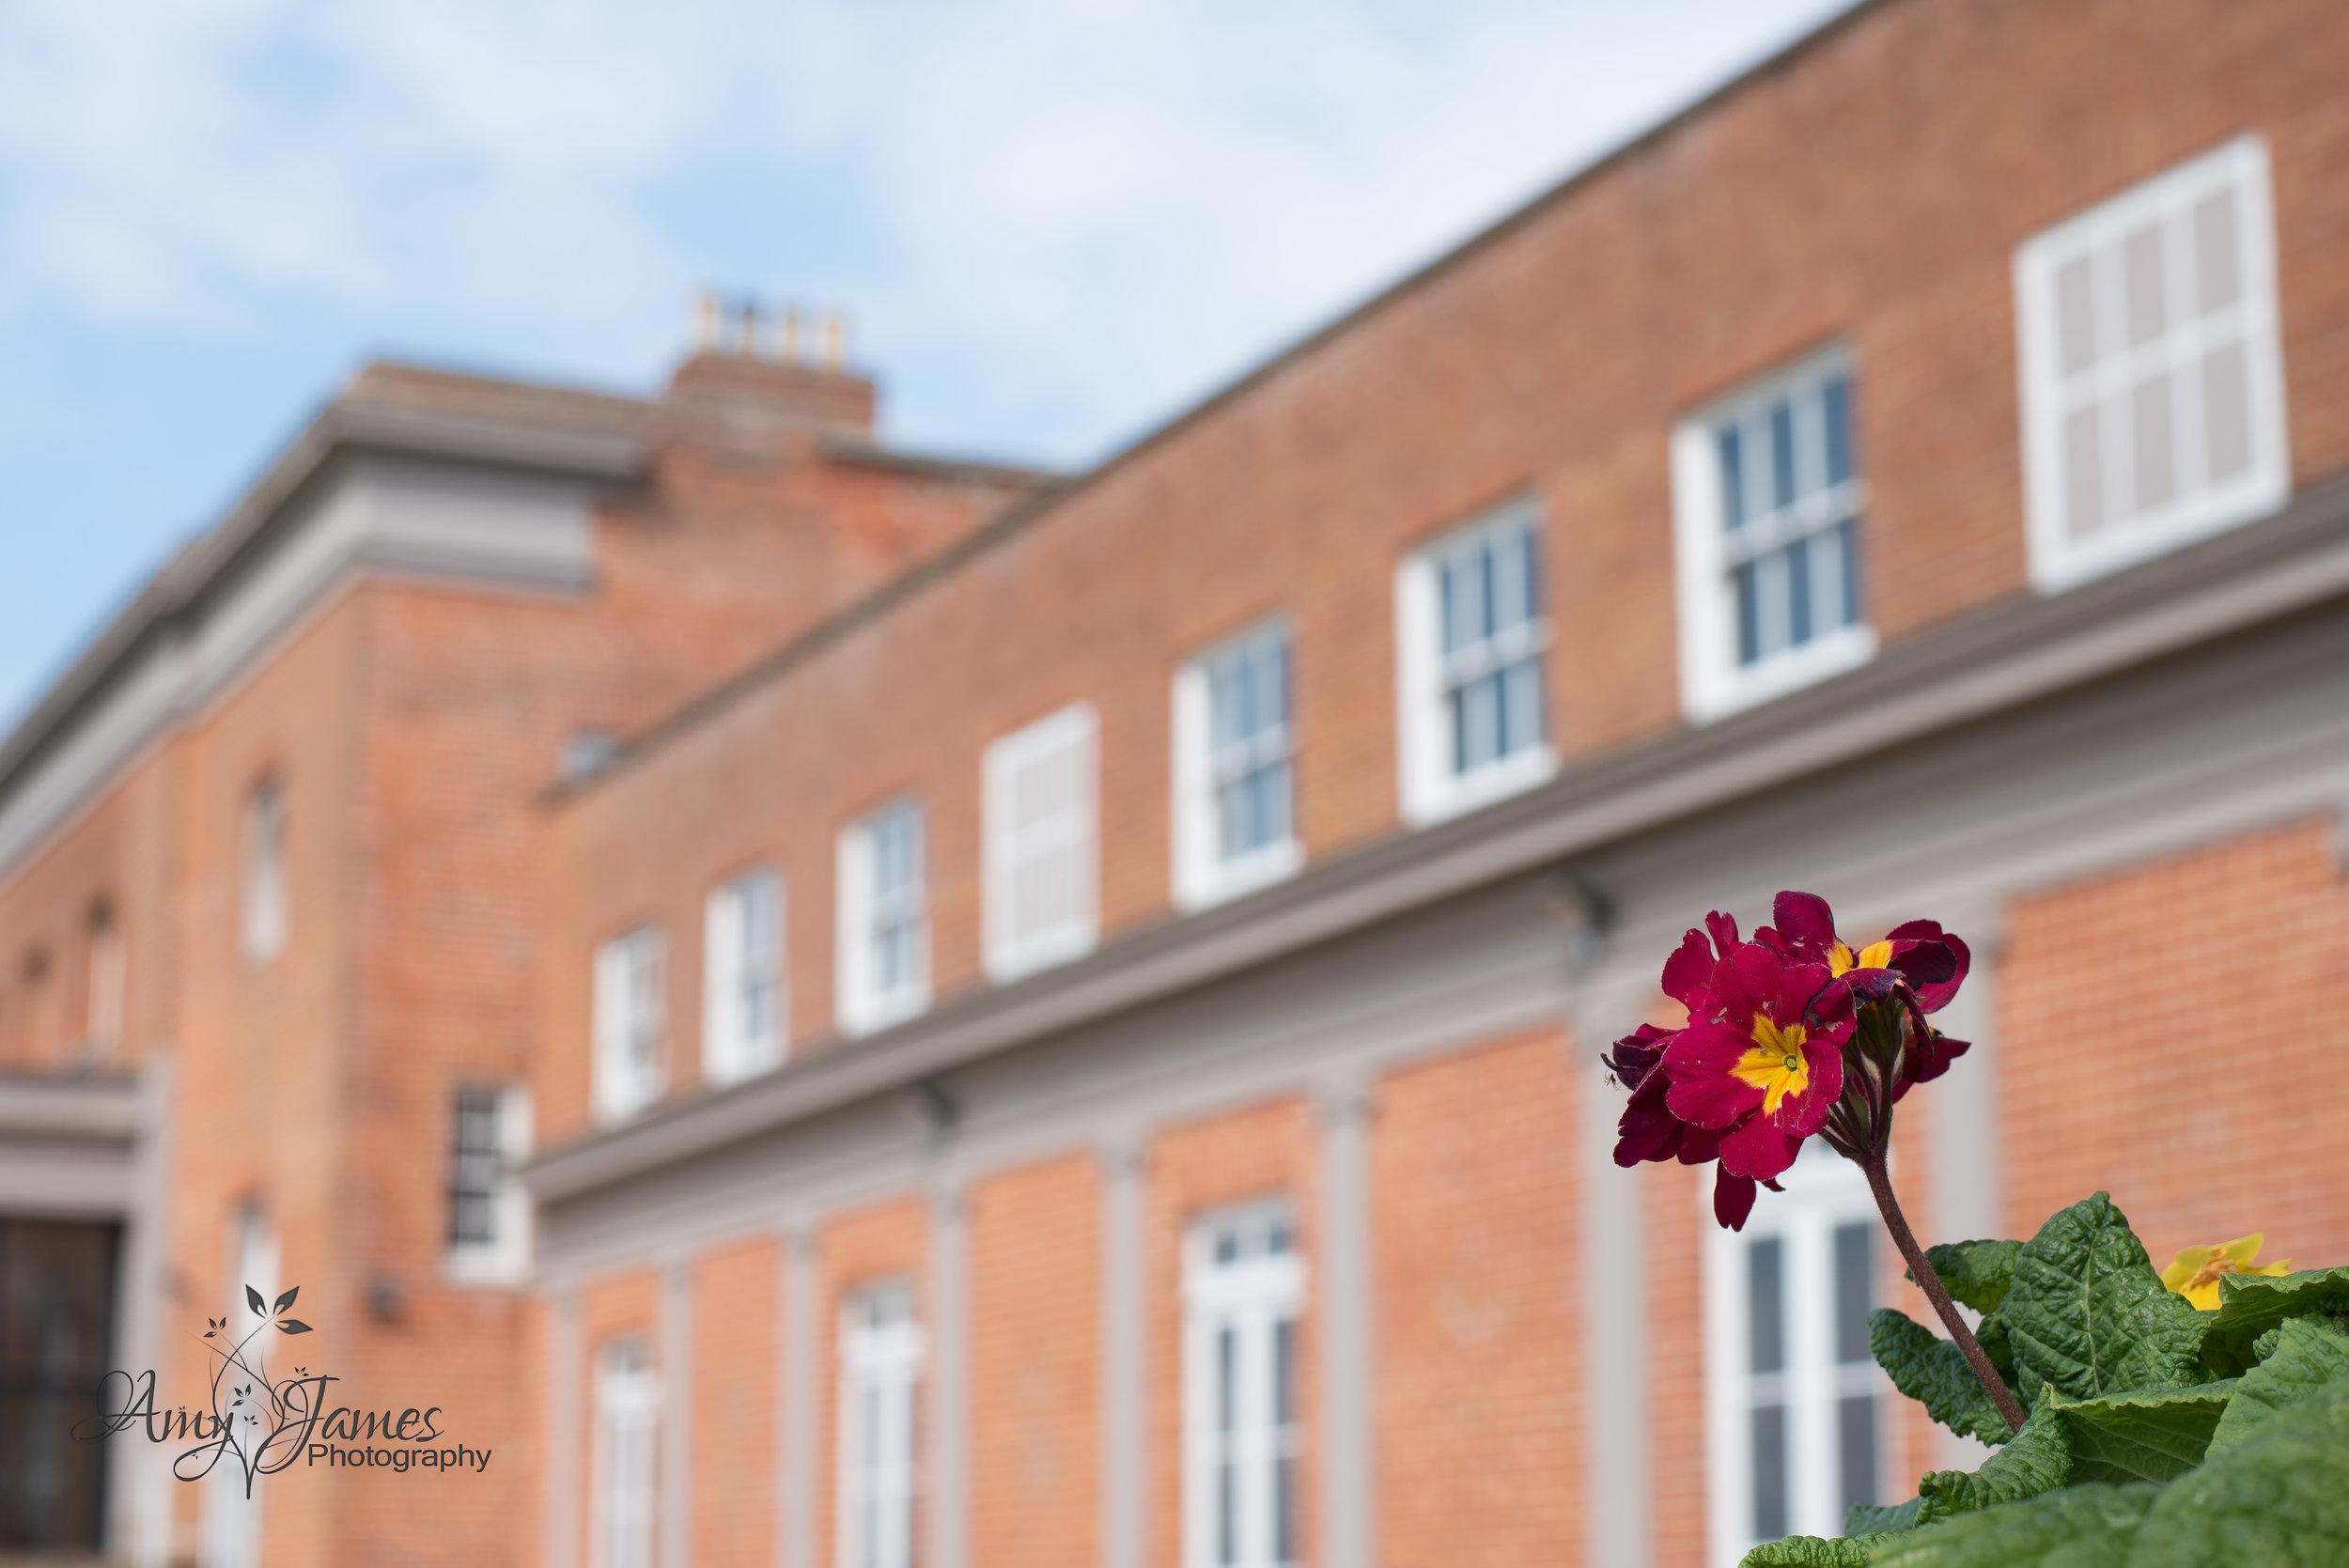 Hampsire Wedding photographer | Northbrook Park wedding photographer | Surrey Wedding photographer | Amy James Photography